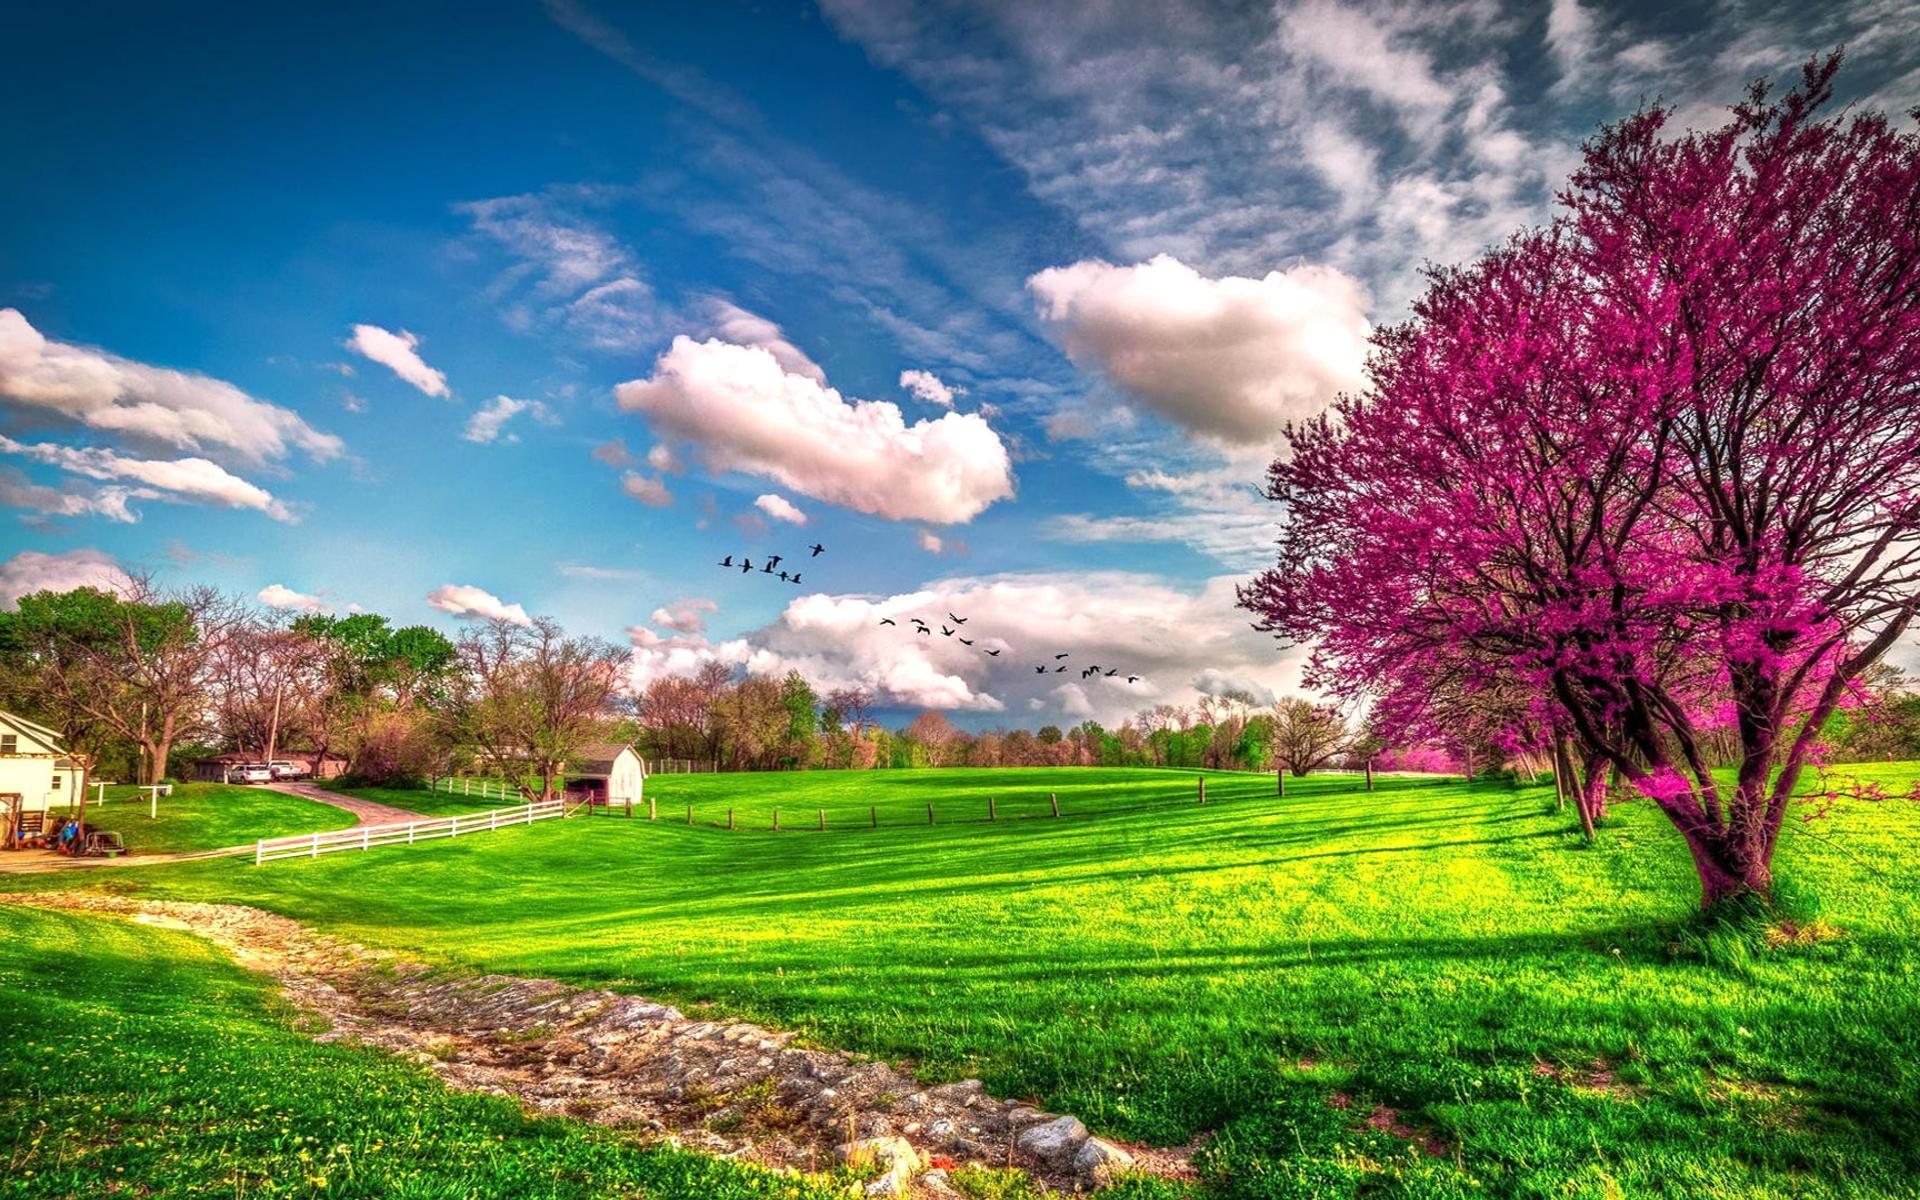 Landscape beautiful spring nature - HD wallpaper Wallpaper ...